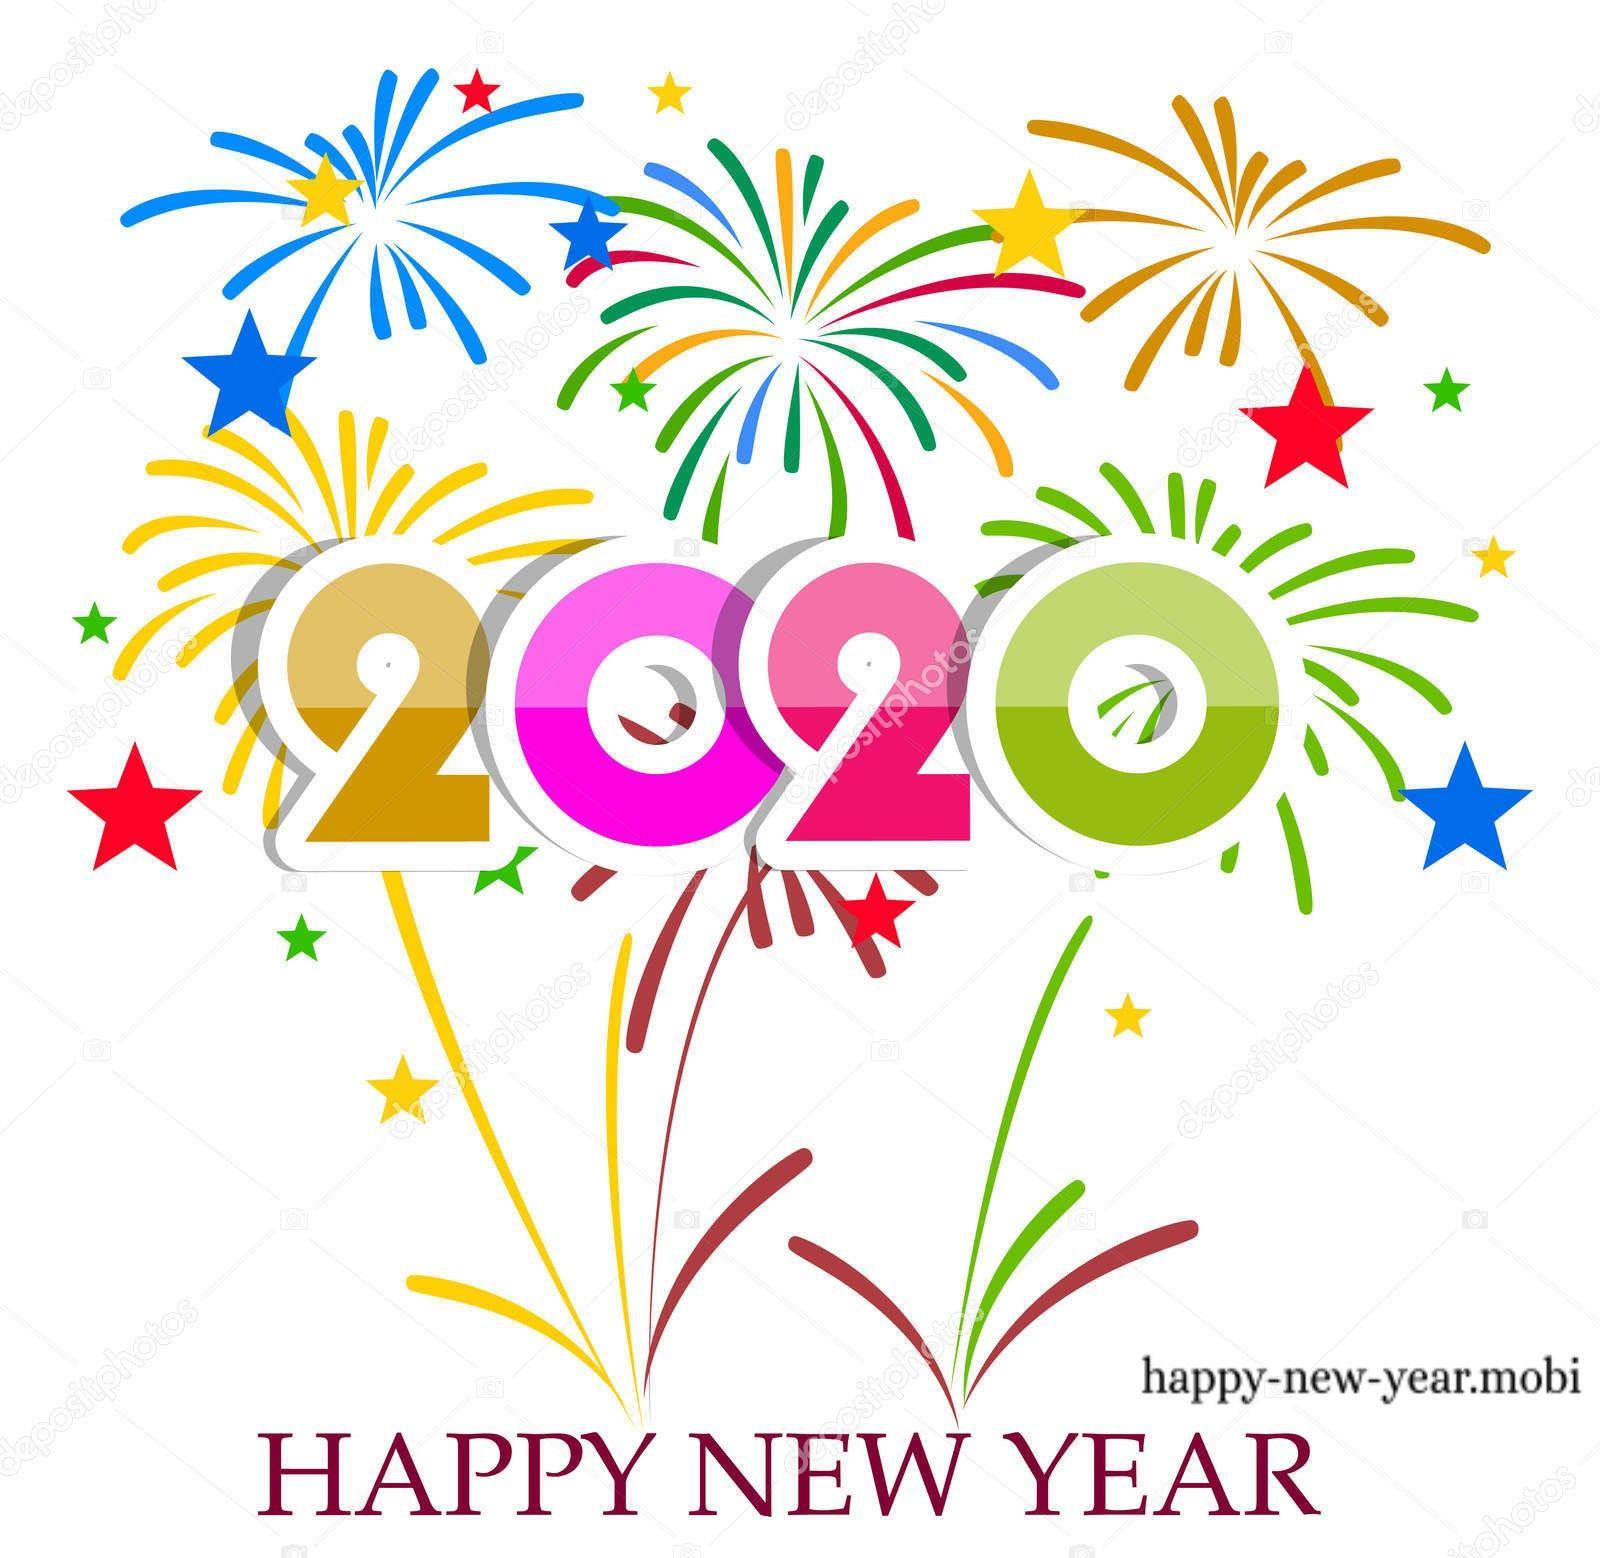 New Year 2020 Happy New Year Wishes Happy New Year Images Happy New Year Greetings